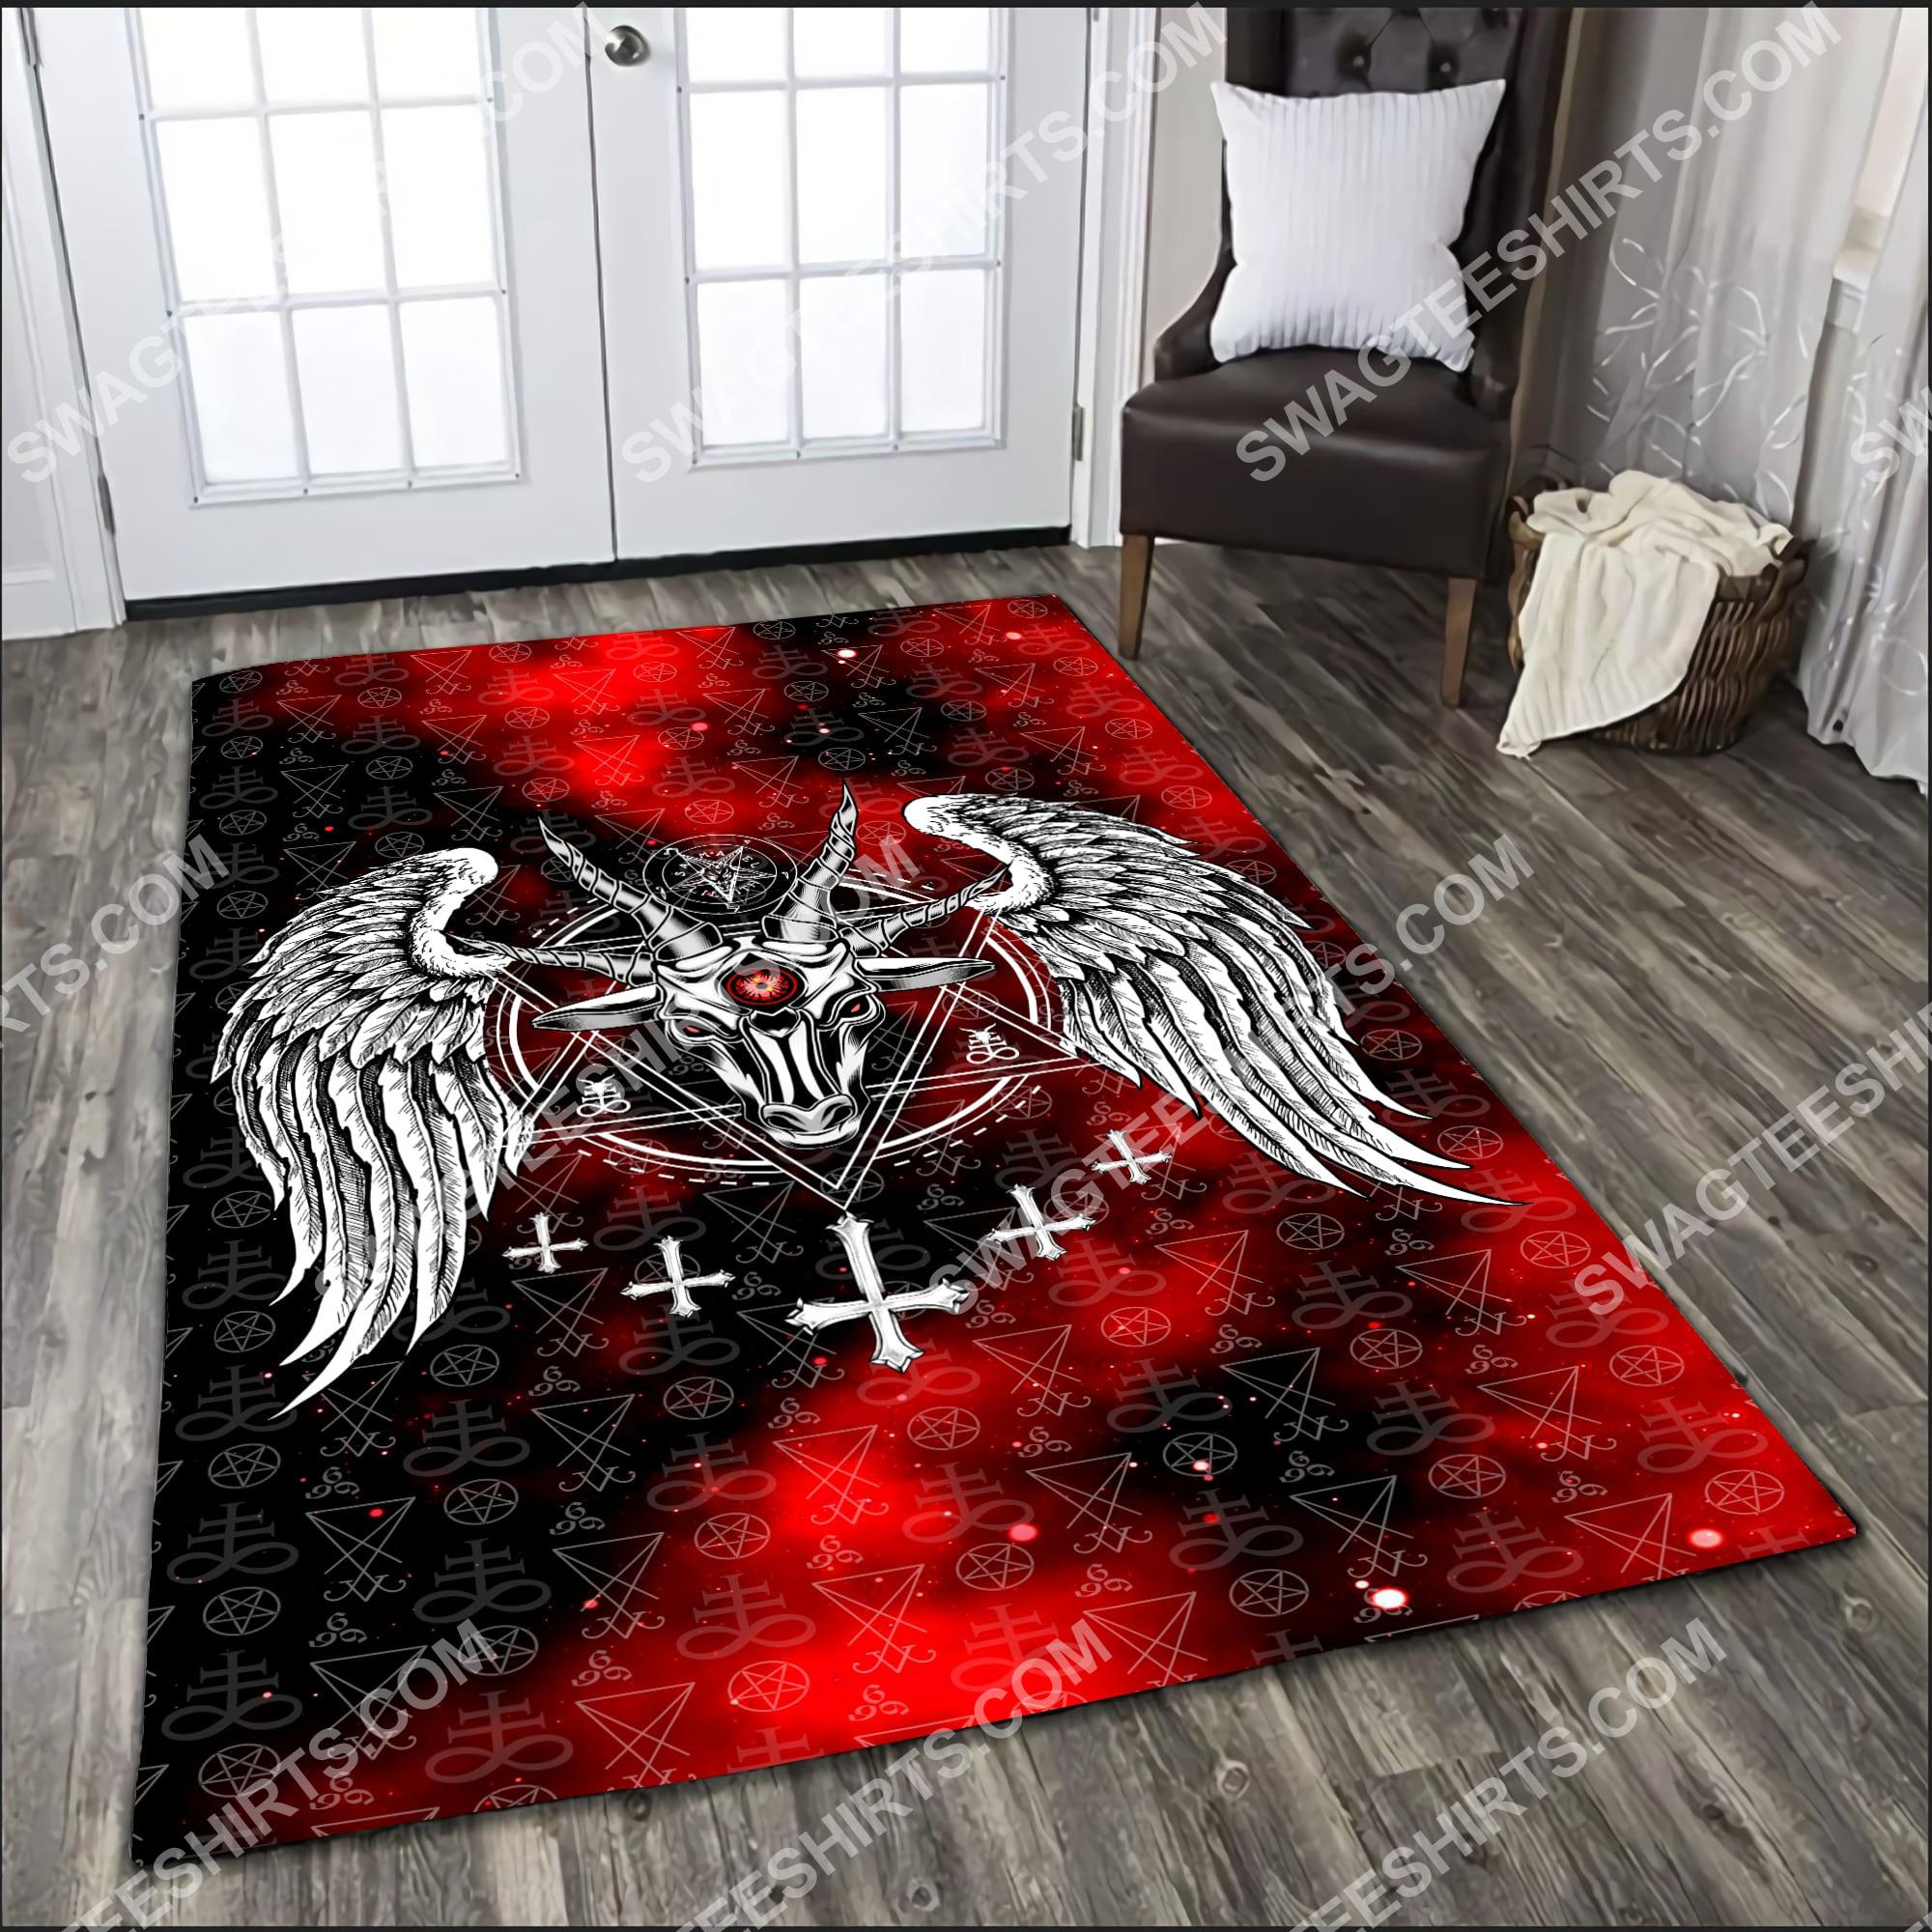 the satanic symbol all over printed rug 3(1)